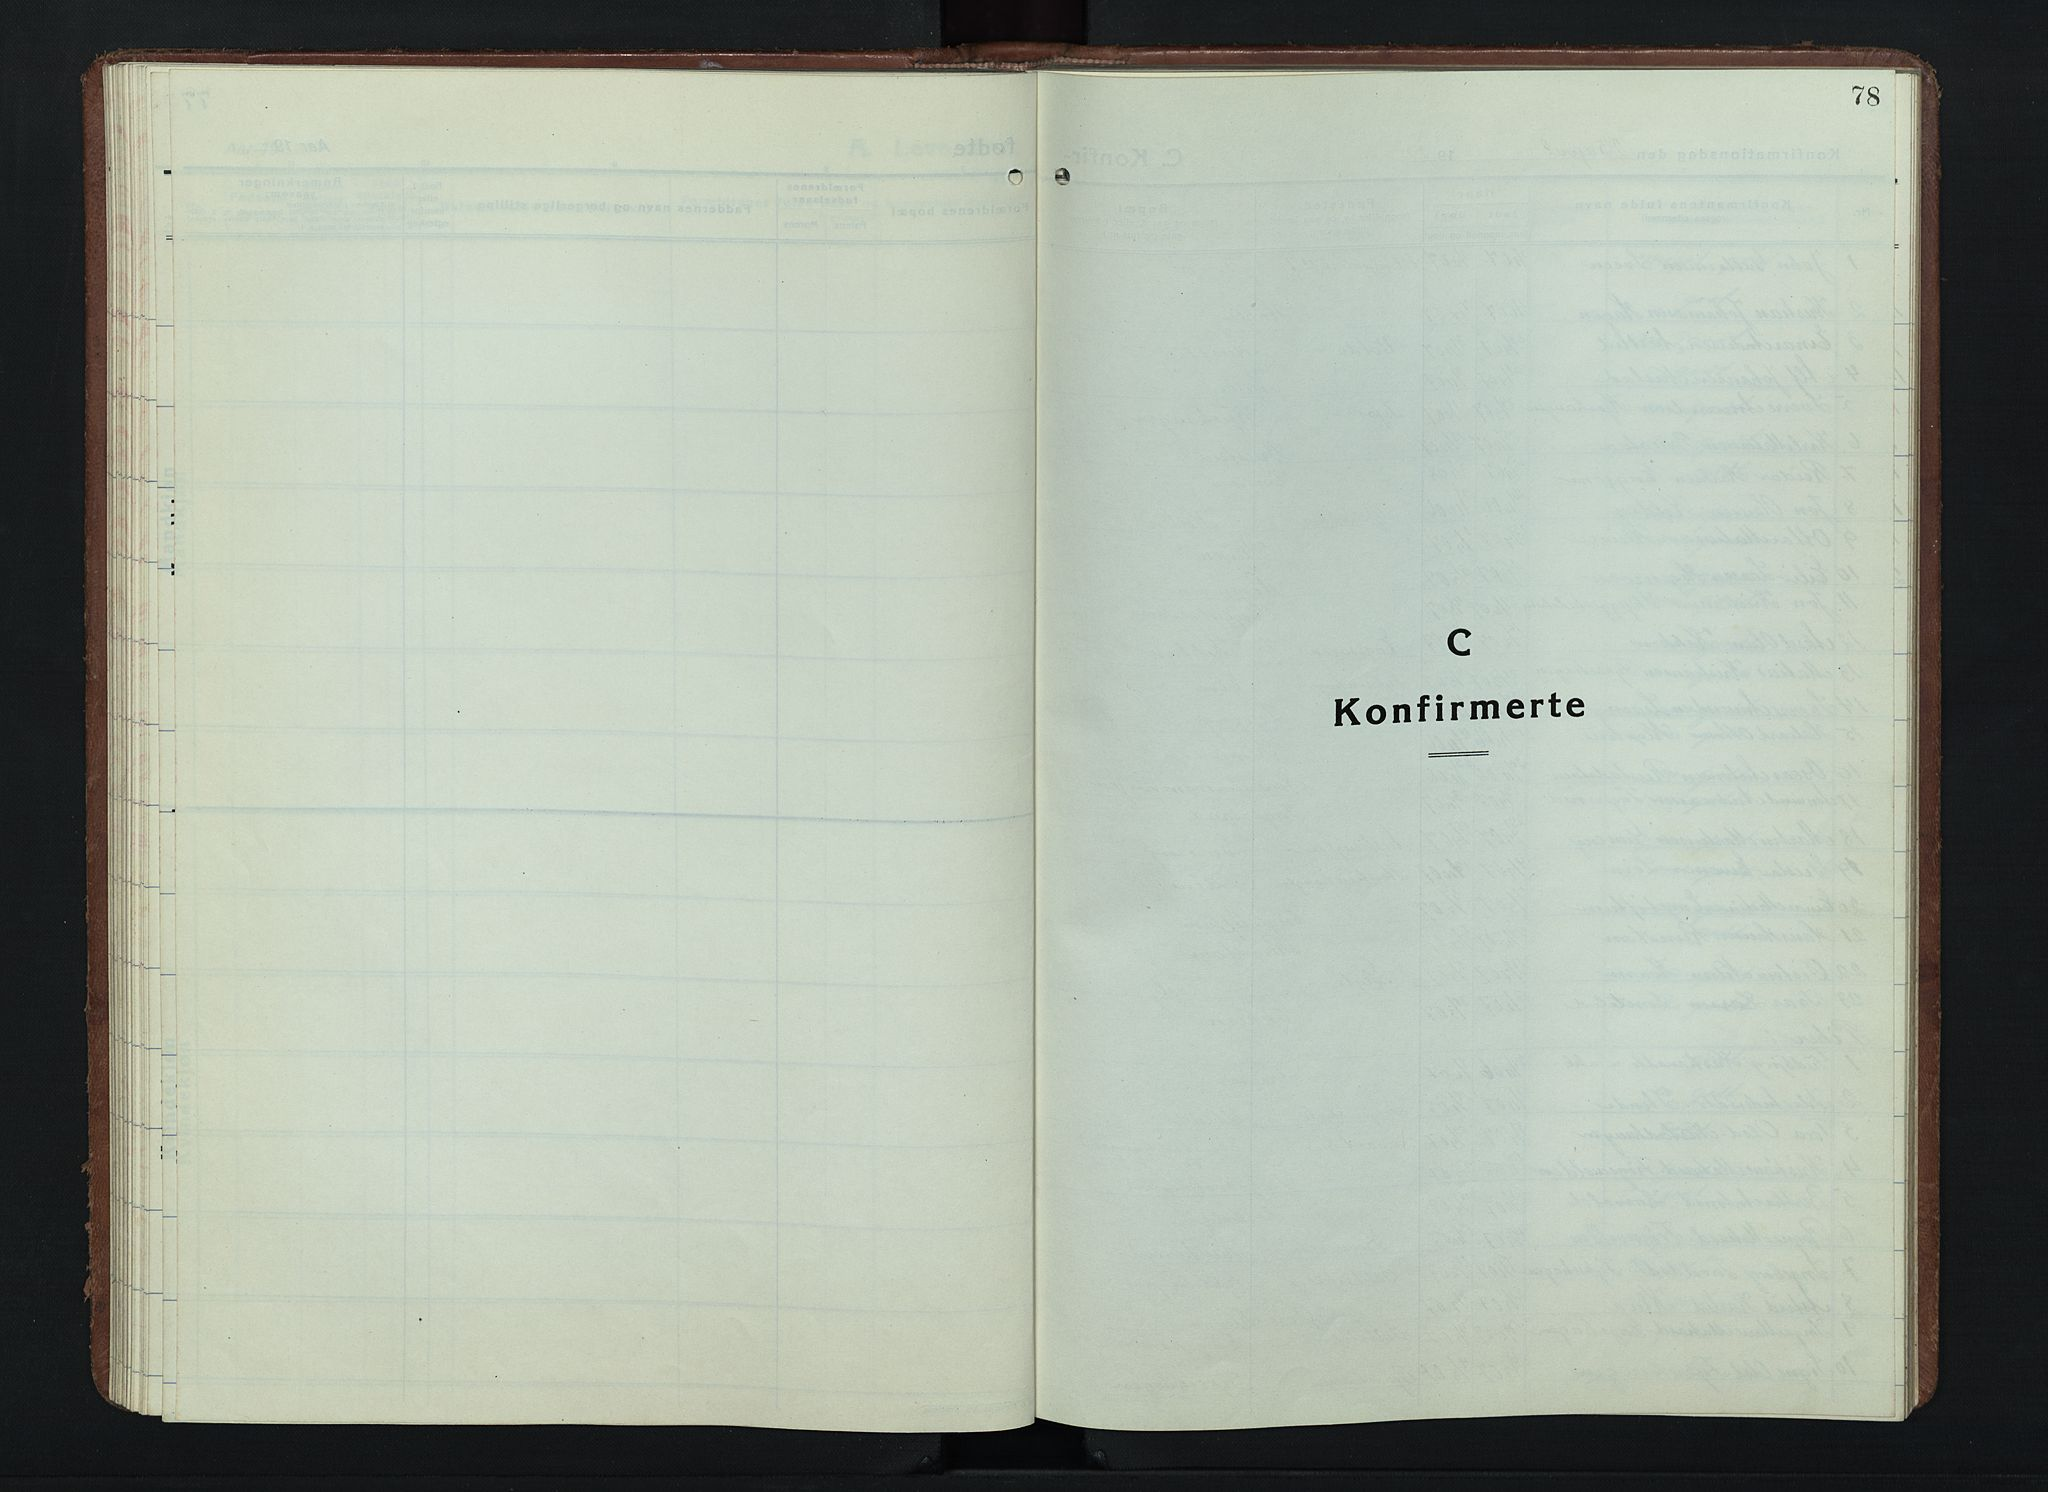 SAH, Østre Gausdal prestekontor, Klokkerbok nr. 6, 1922-1945, s. 78